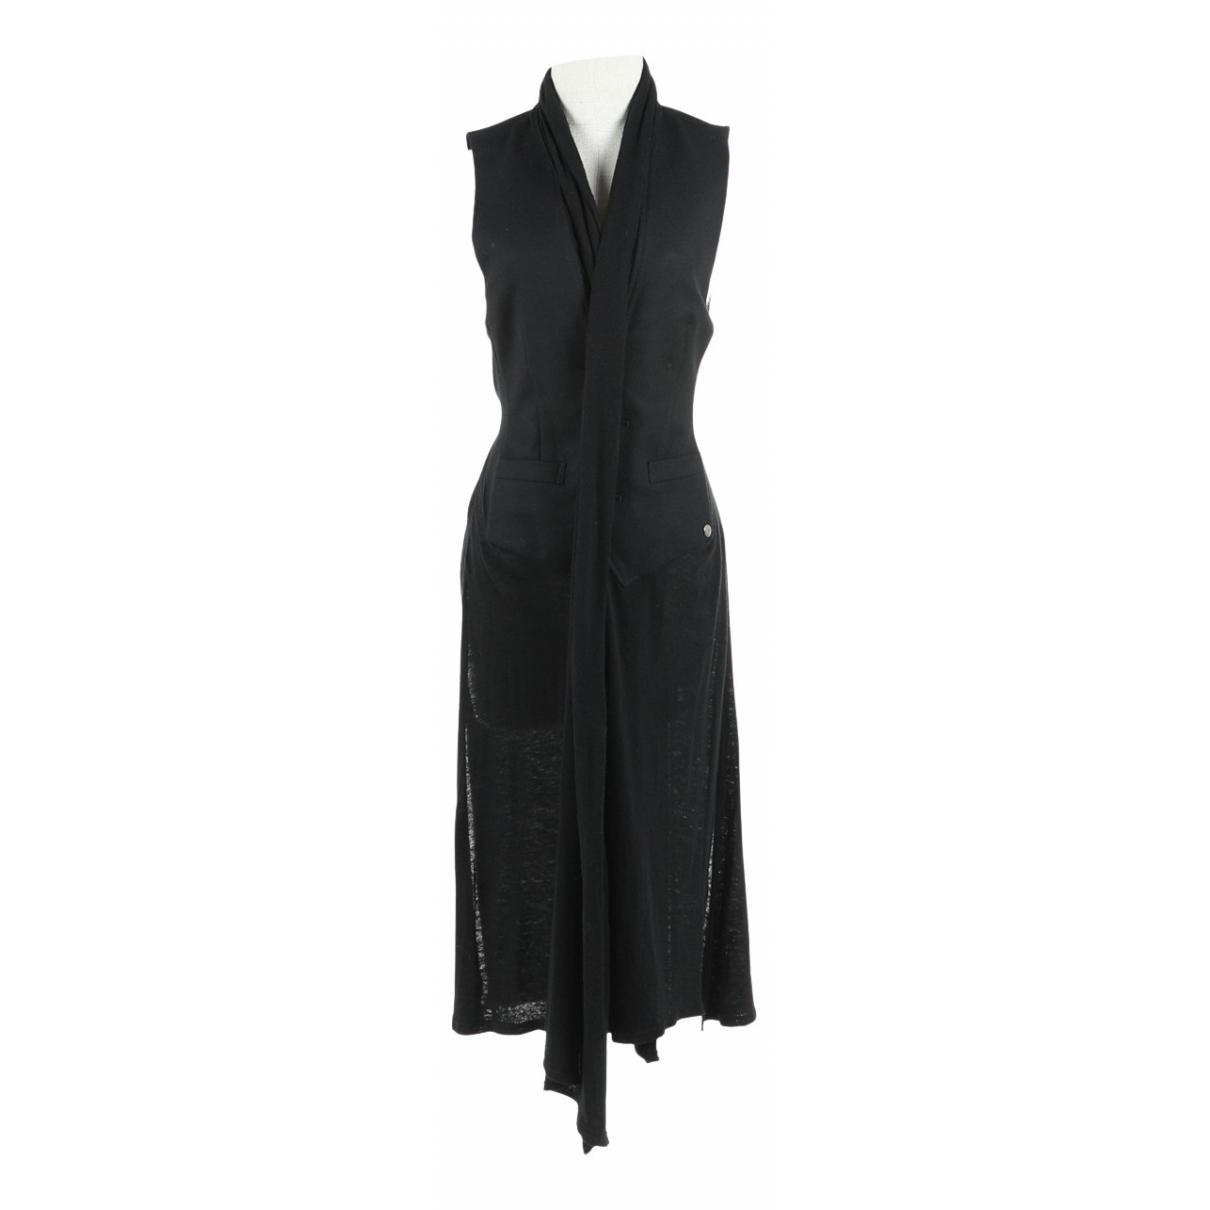 Miharayasuhiro - Pull   pour femme en laine - noir